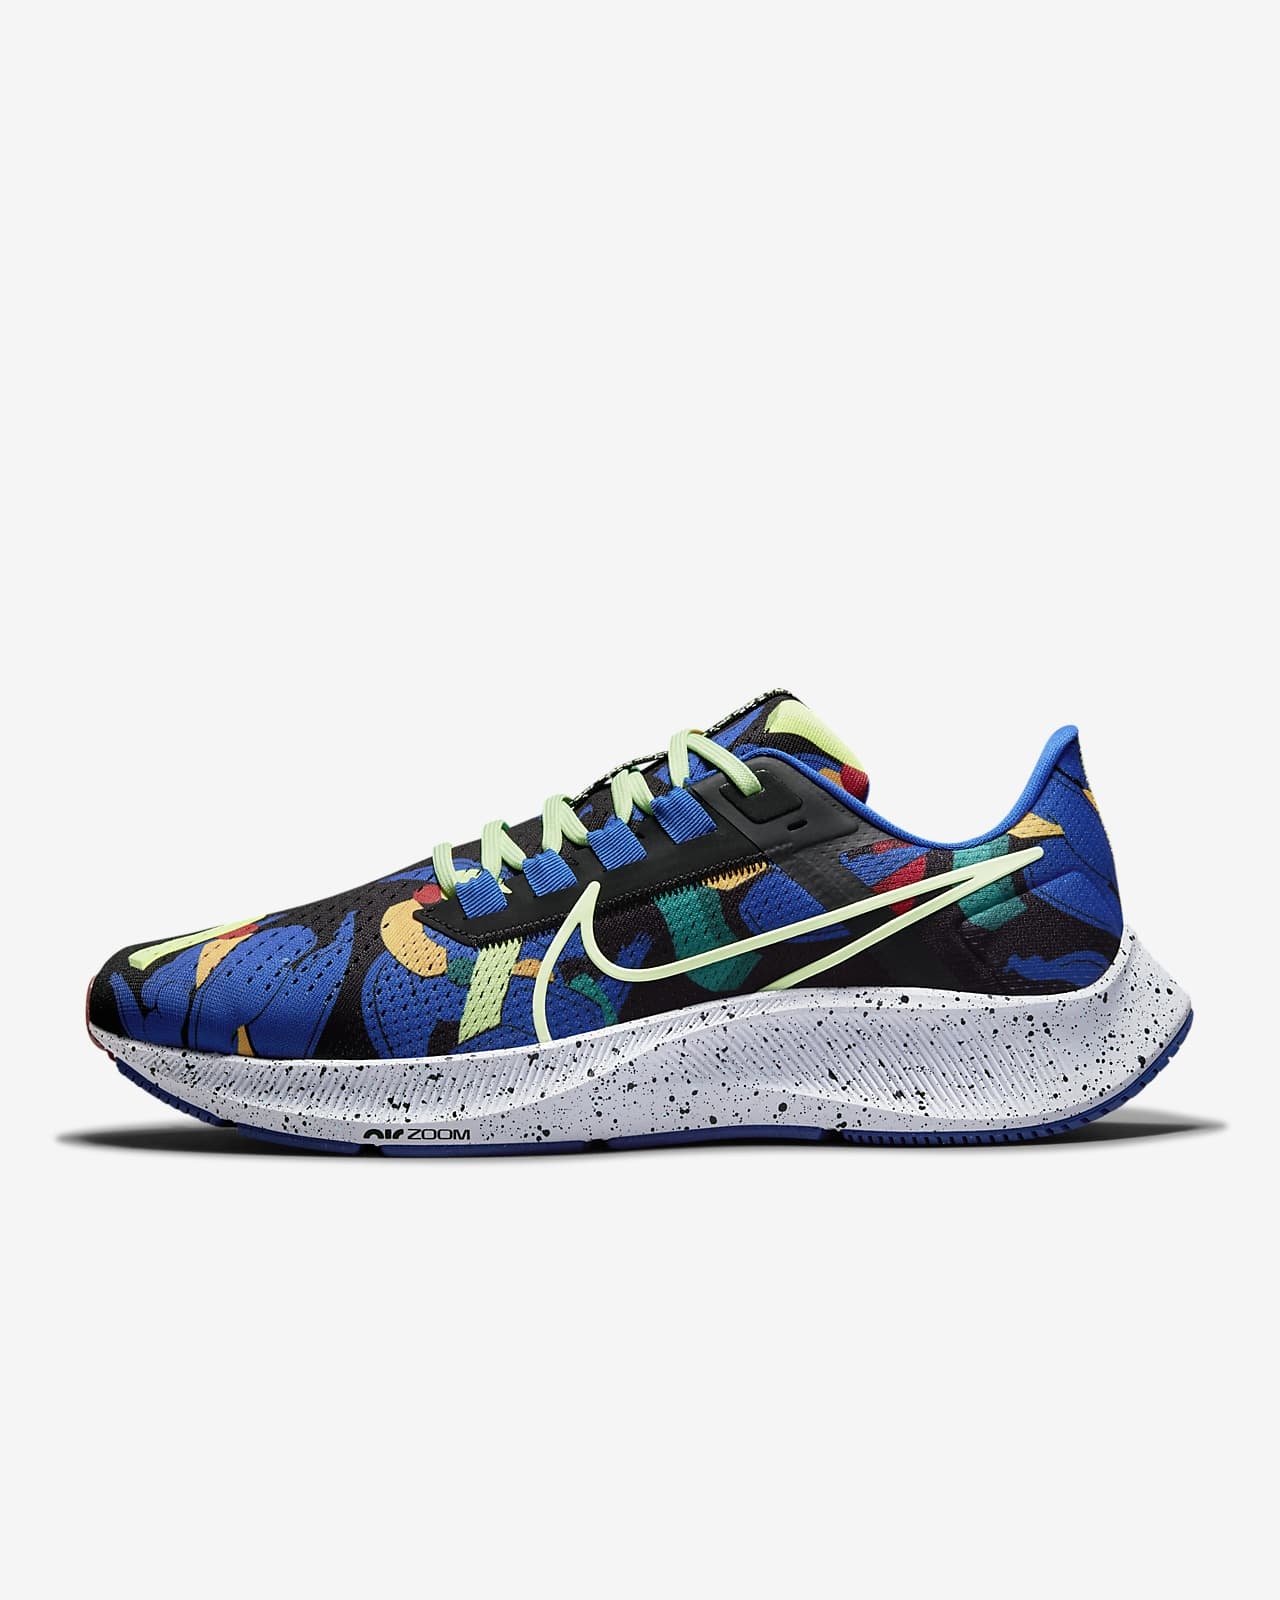 Nike Air Zoom Pegasus 38 A.I.R. Sapatilhas de running Kelly Anna London para homem